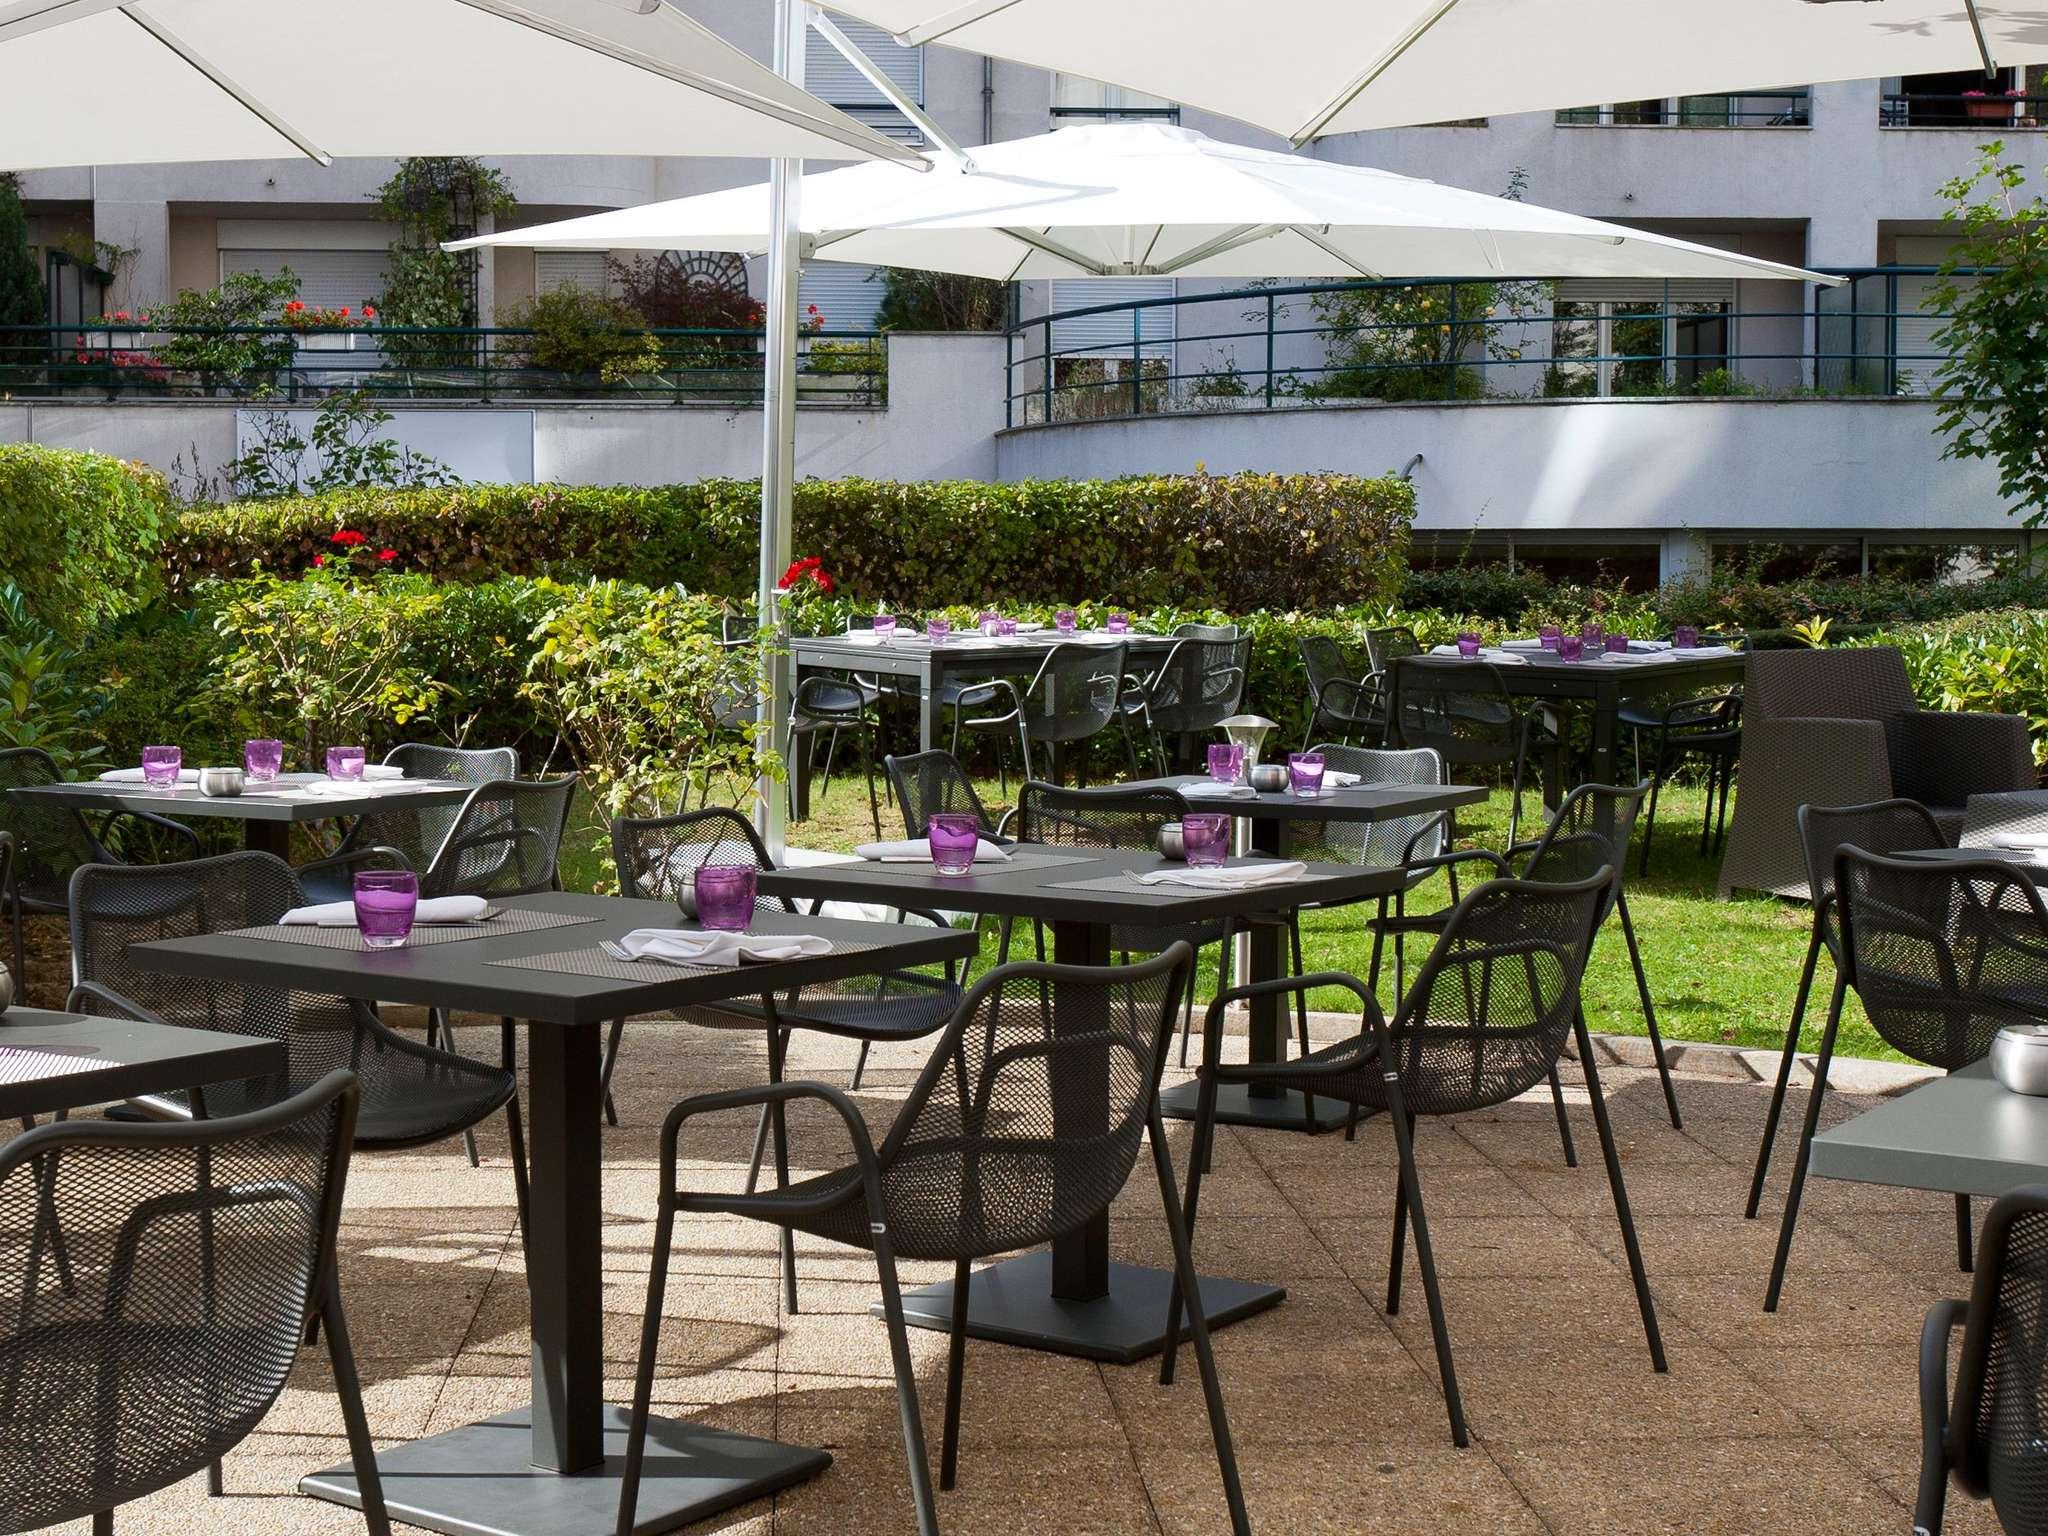 Hotel – Novotel Paris Sud Porte de Charenton